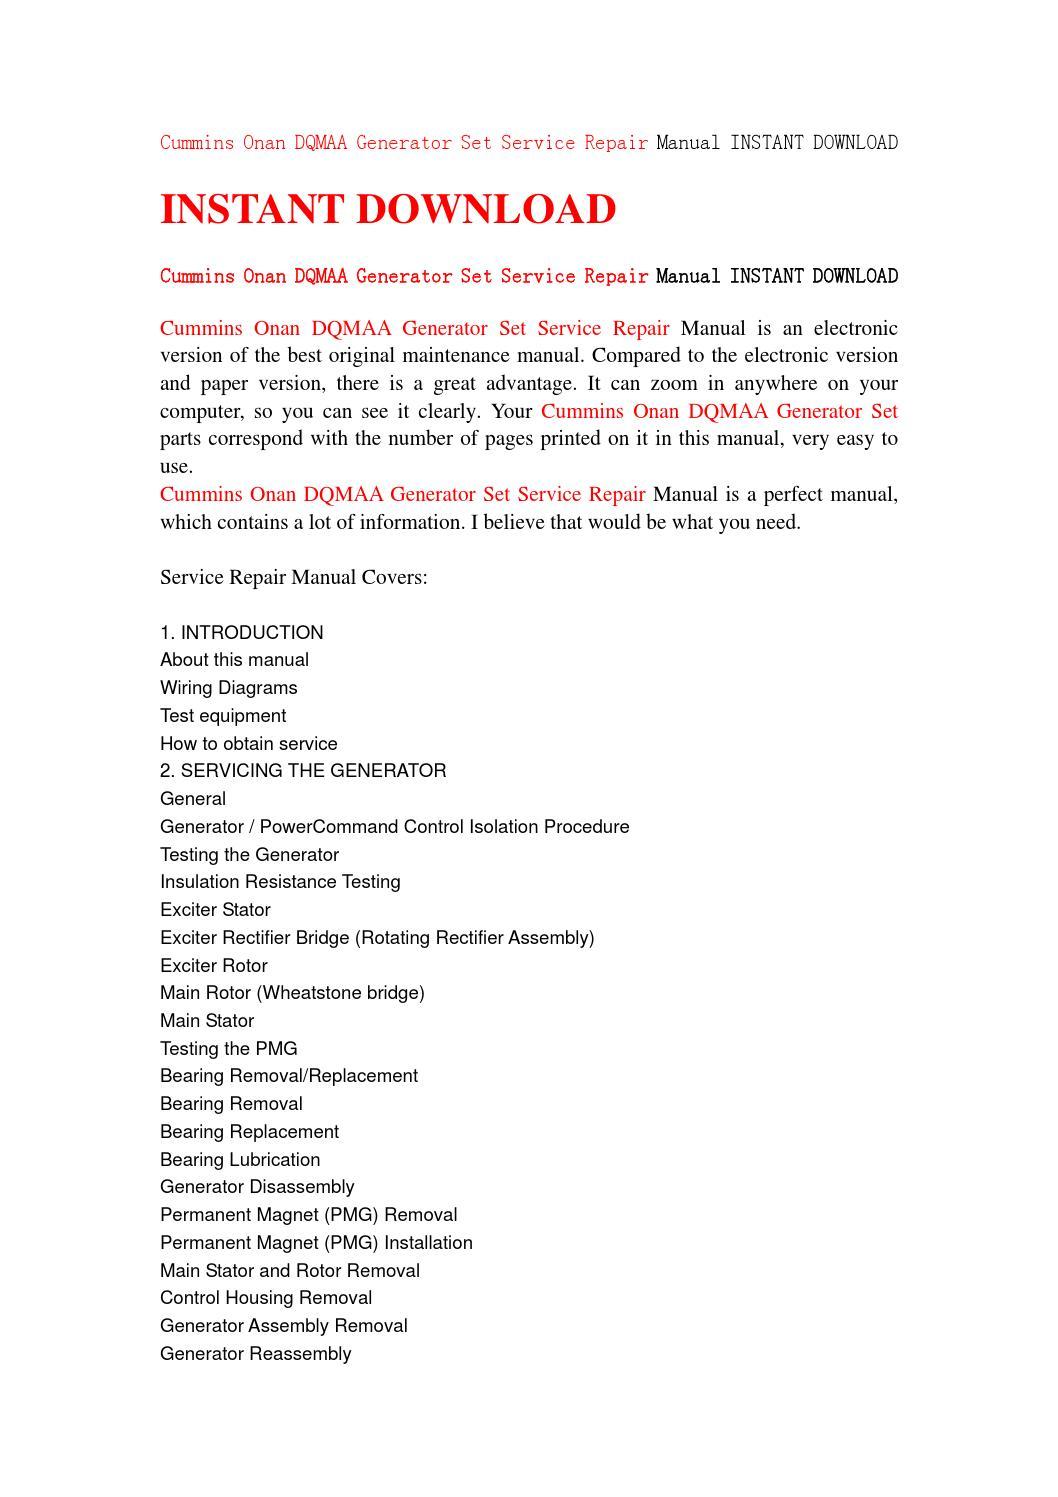 Cummins onan dqmaa generator set service repair manual instant download by  jfhsenf7ye - issuu